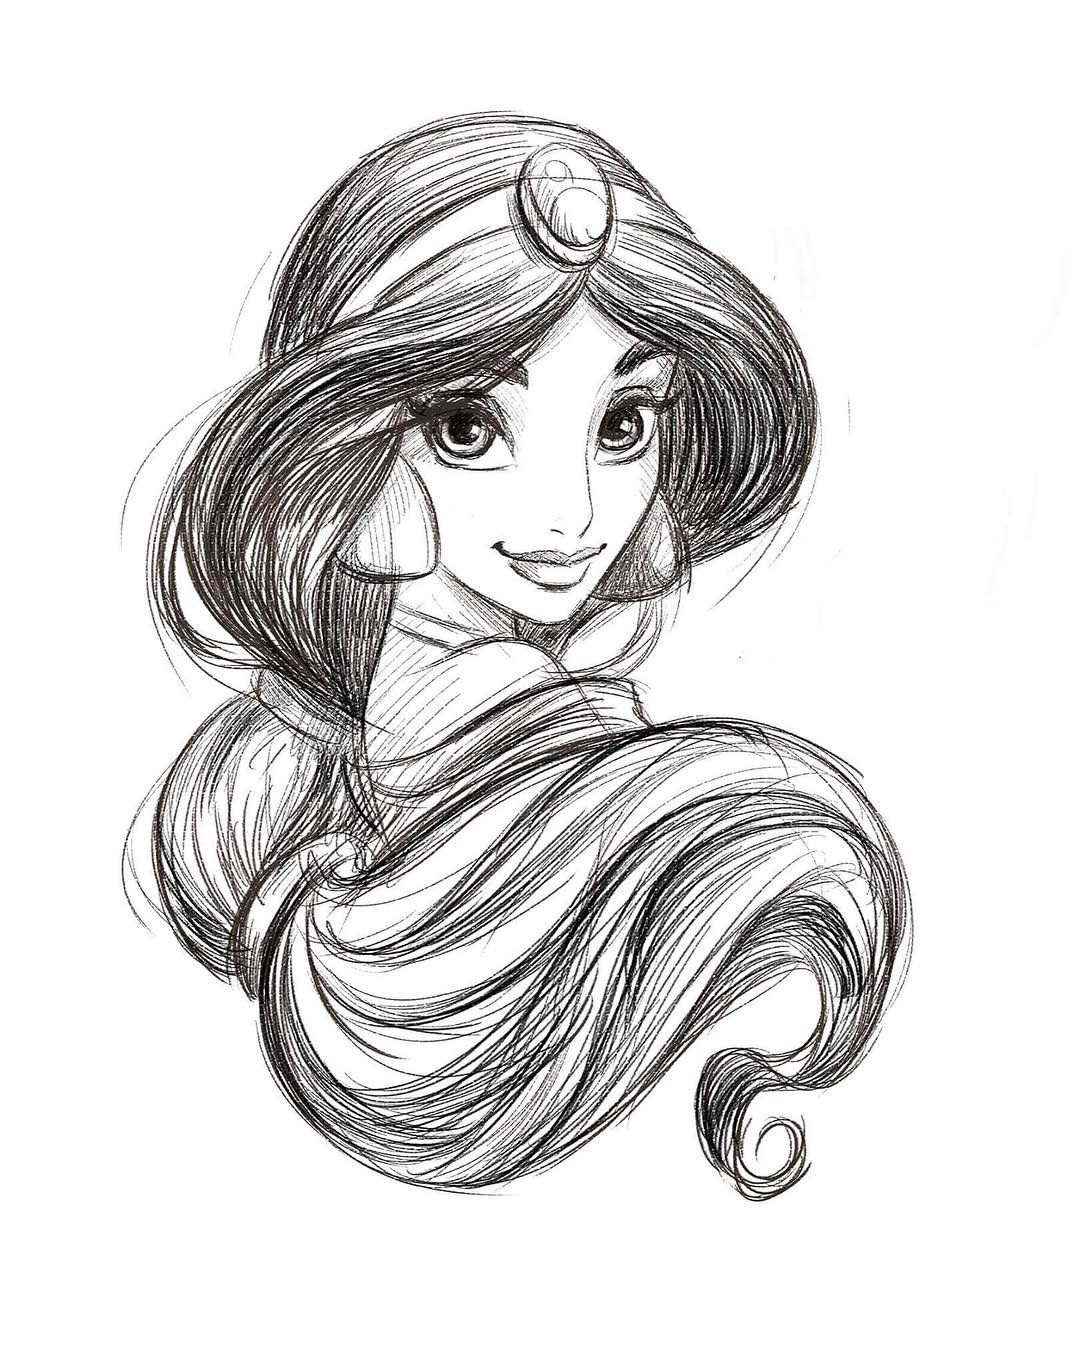 "Dorota Kotarba-Mendez on Instagram: ""Jasmine sketch. #disneyprincess #disney  #sketch  #jasmine #princess #princessjasmine #cartoon"""